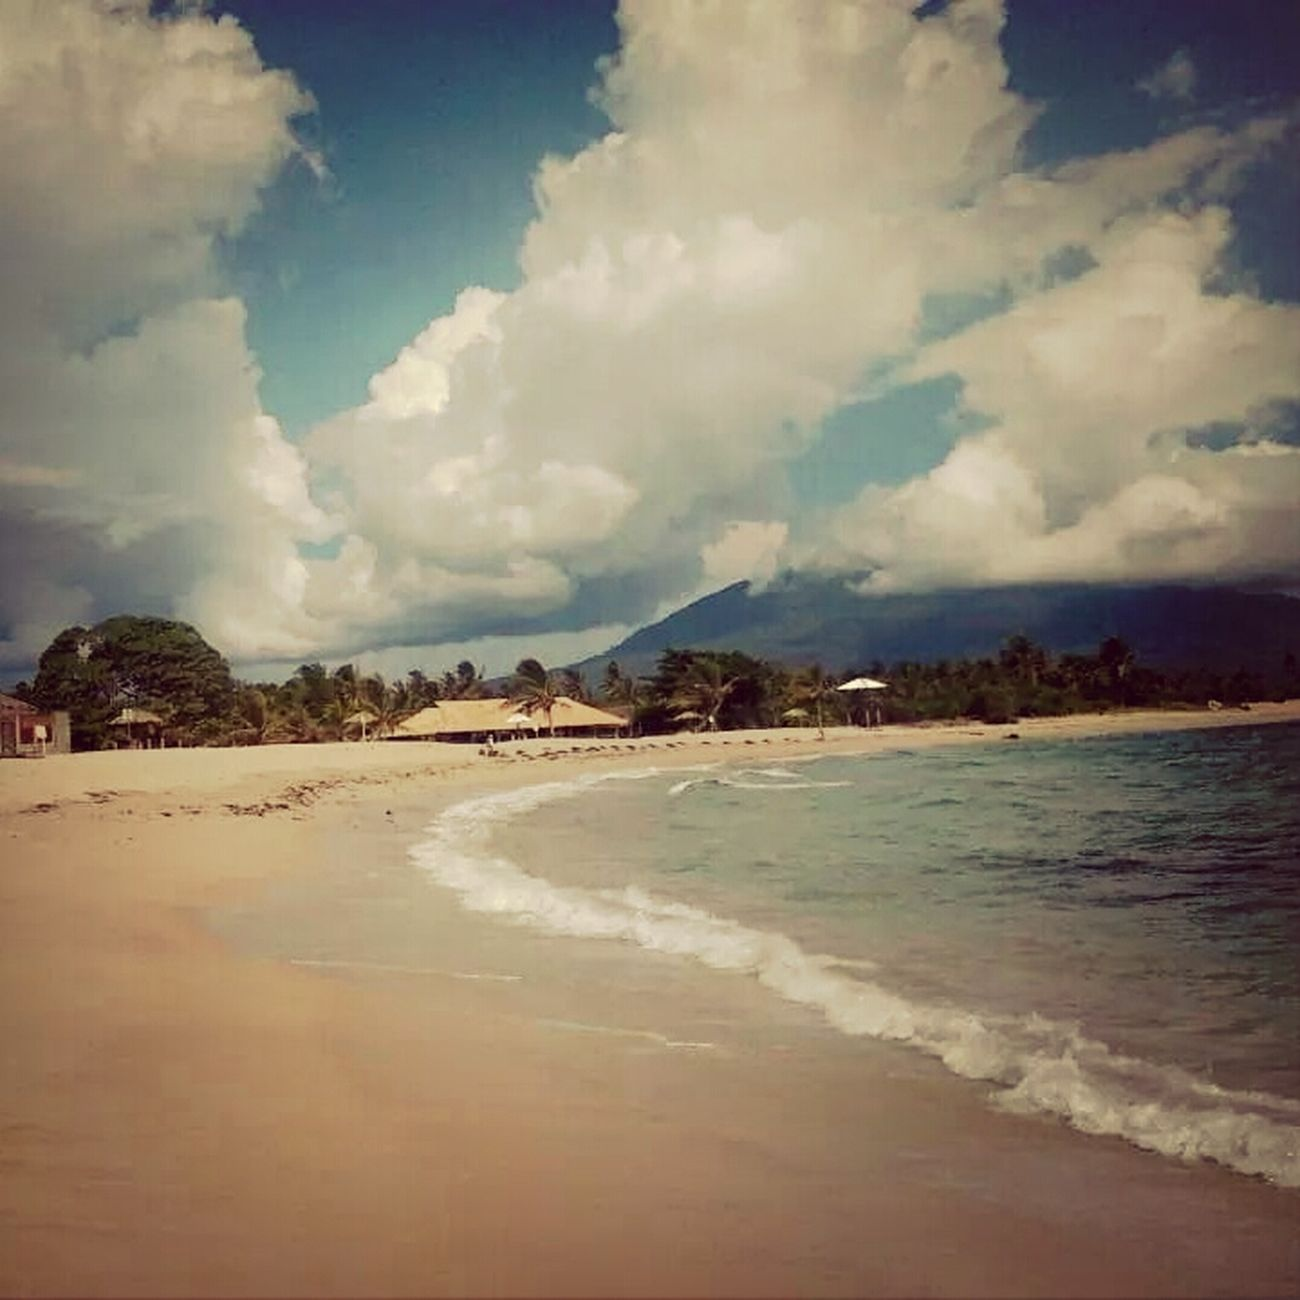 laguna beach Indonesia Scenery Bandar Lampung Beachtimefun Taking Photos #cloudporn